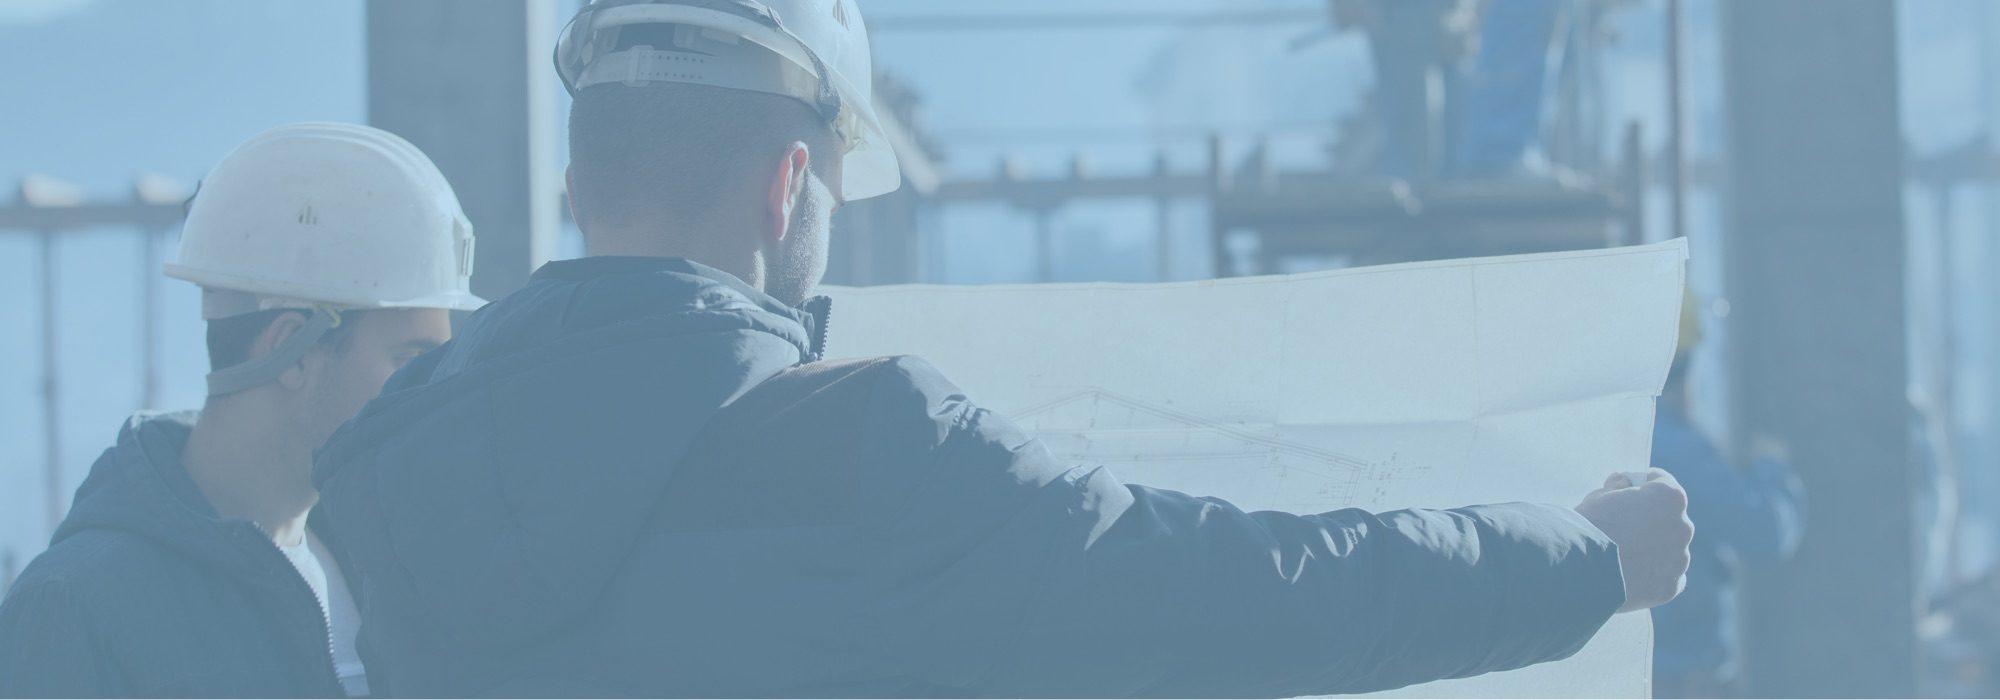 MKC Group - General Contractor